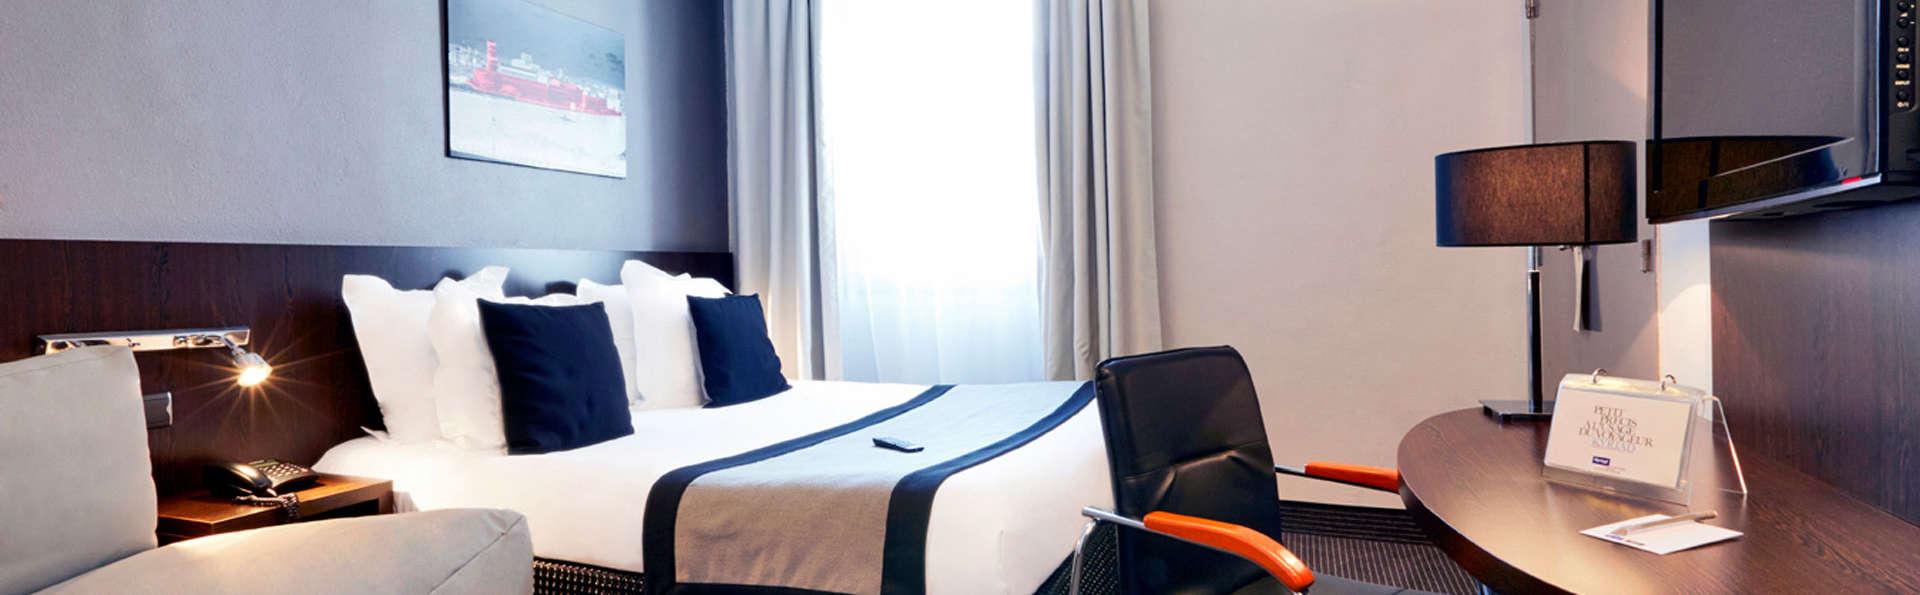 Hôtel Kyriad Marseille Centre Paradis-Préfecture - EDIT_room5.jpg